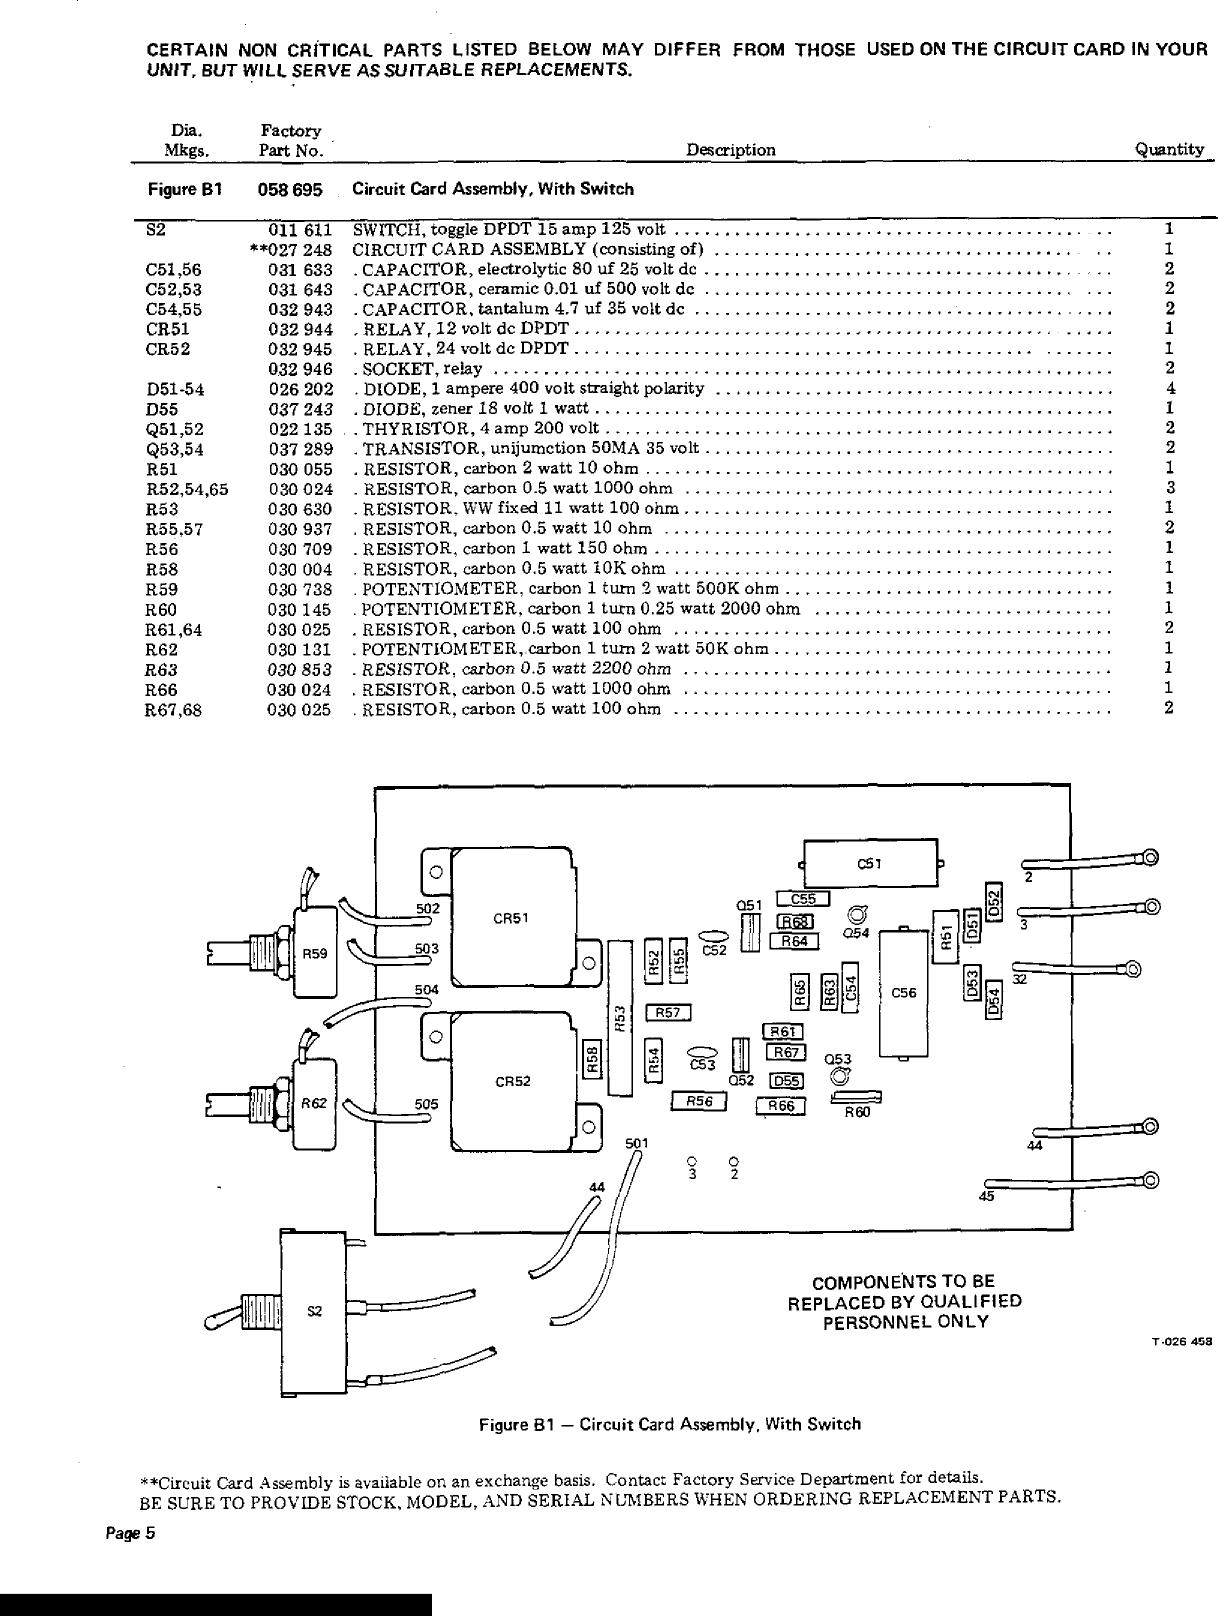 millermatic 35 service manual